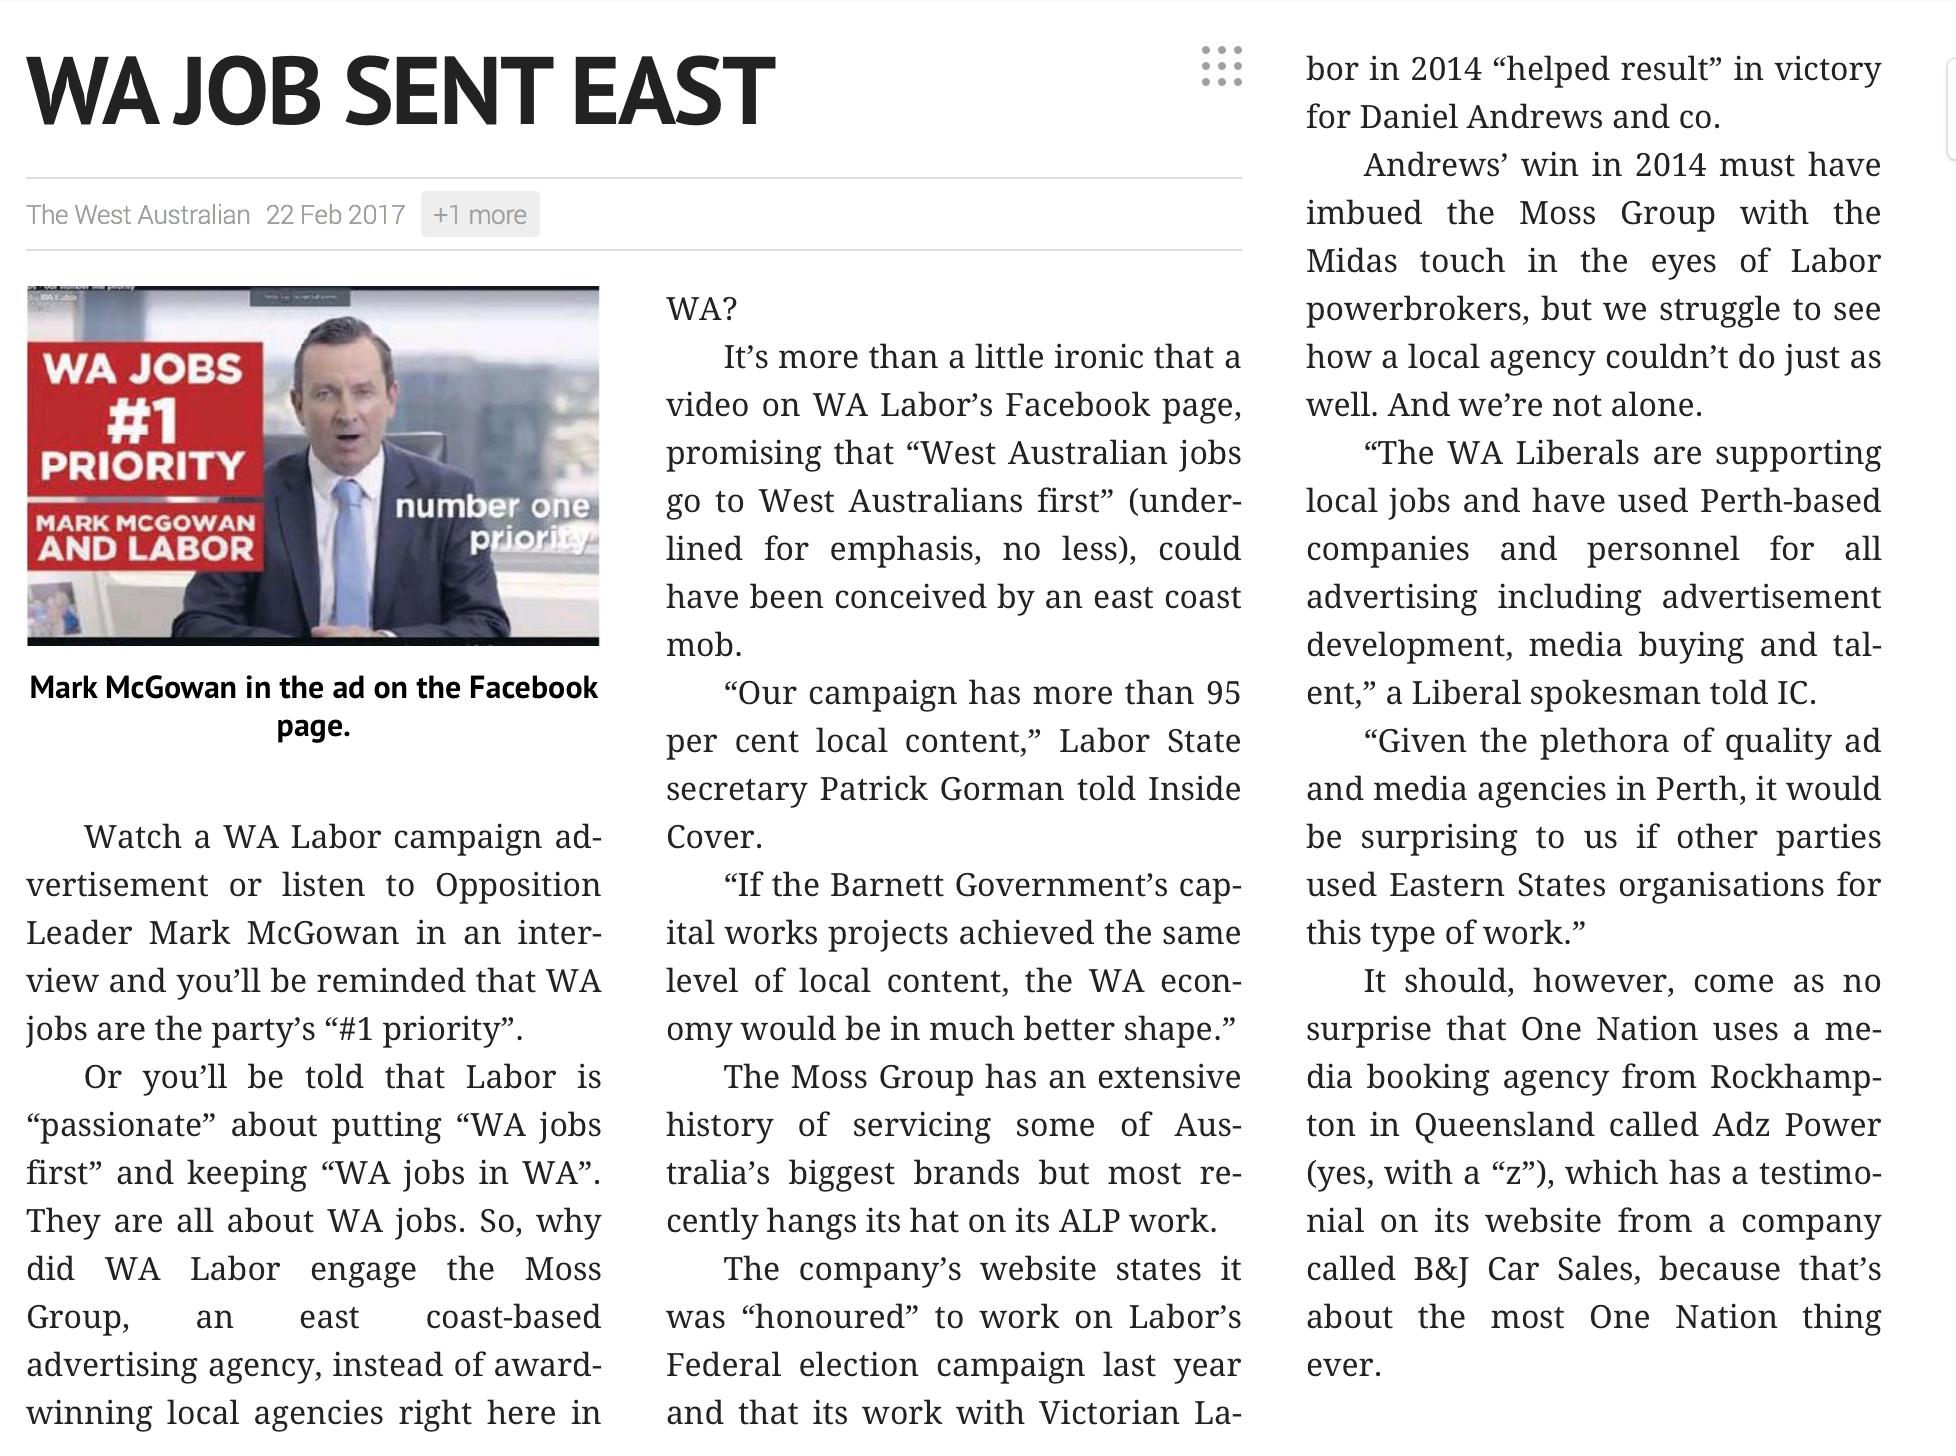 The West Australian, 22 February, 2017